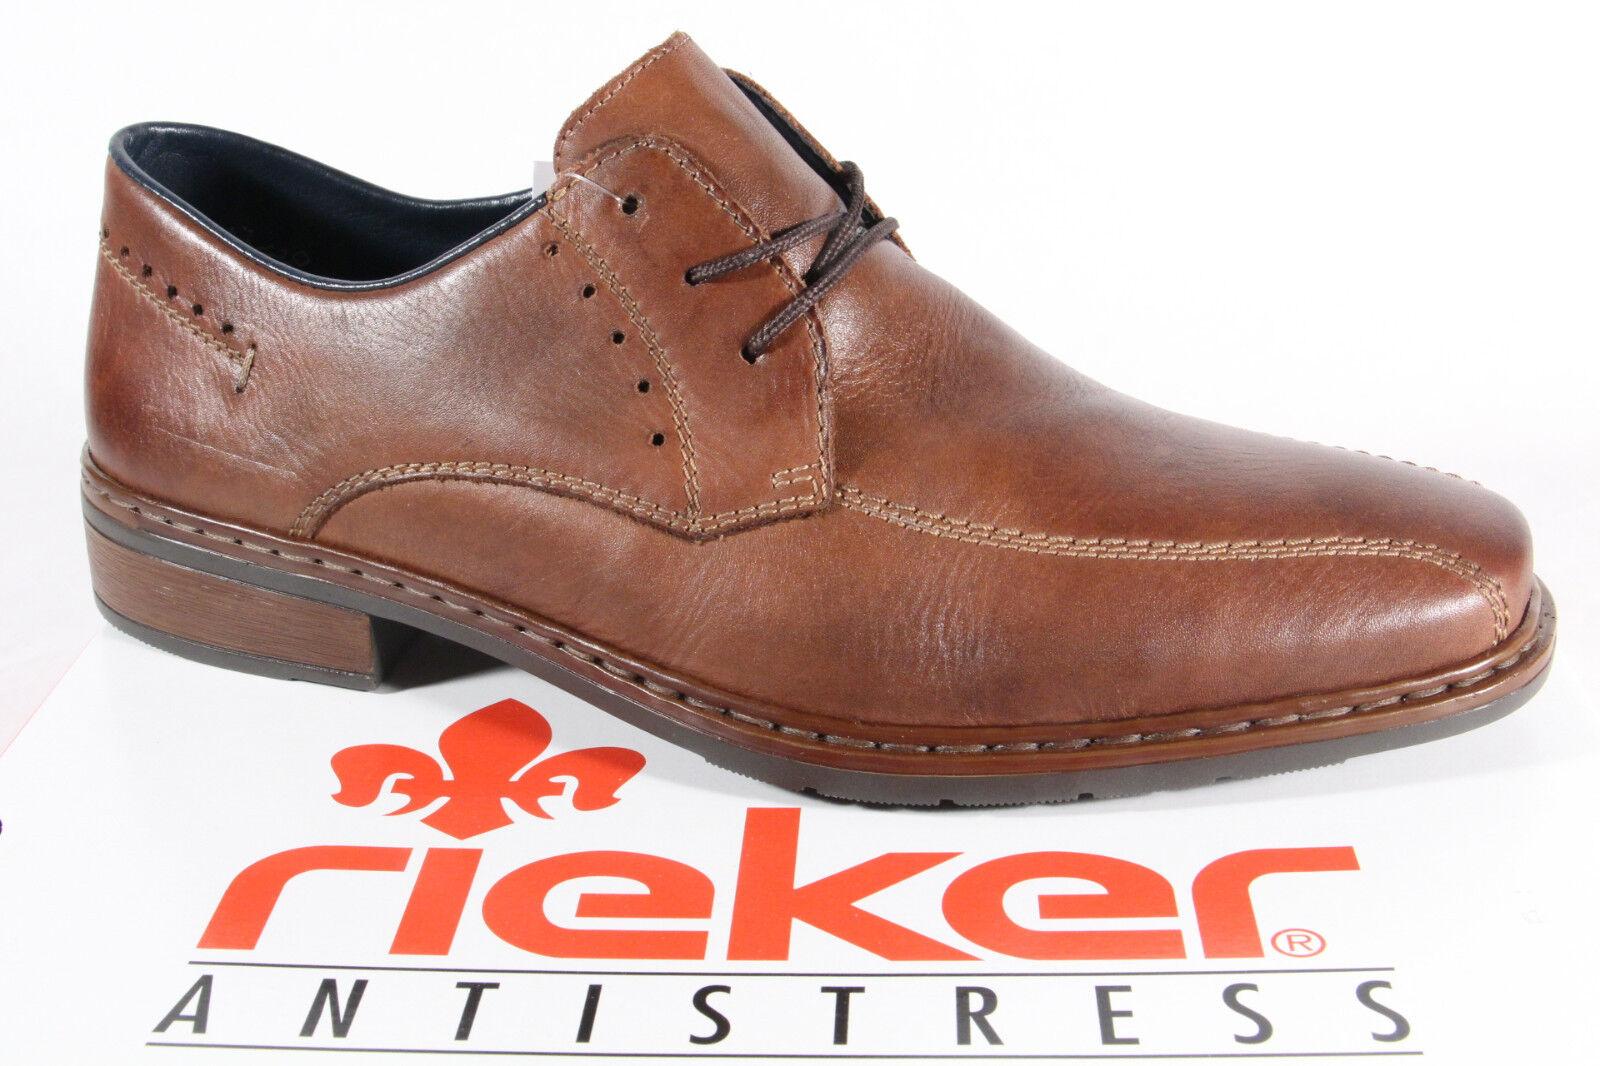 Halbschuhe 13032 Sneakers braun Leder   NEU! Rieker Herren Schnürschuhe